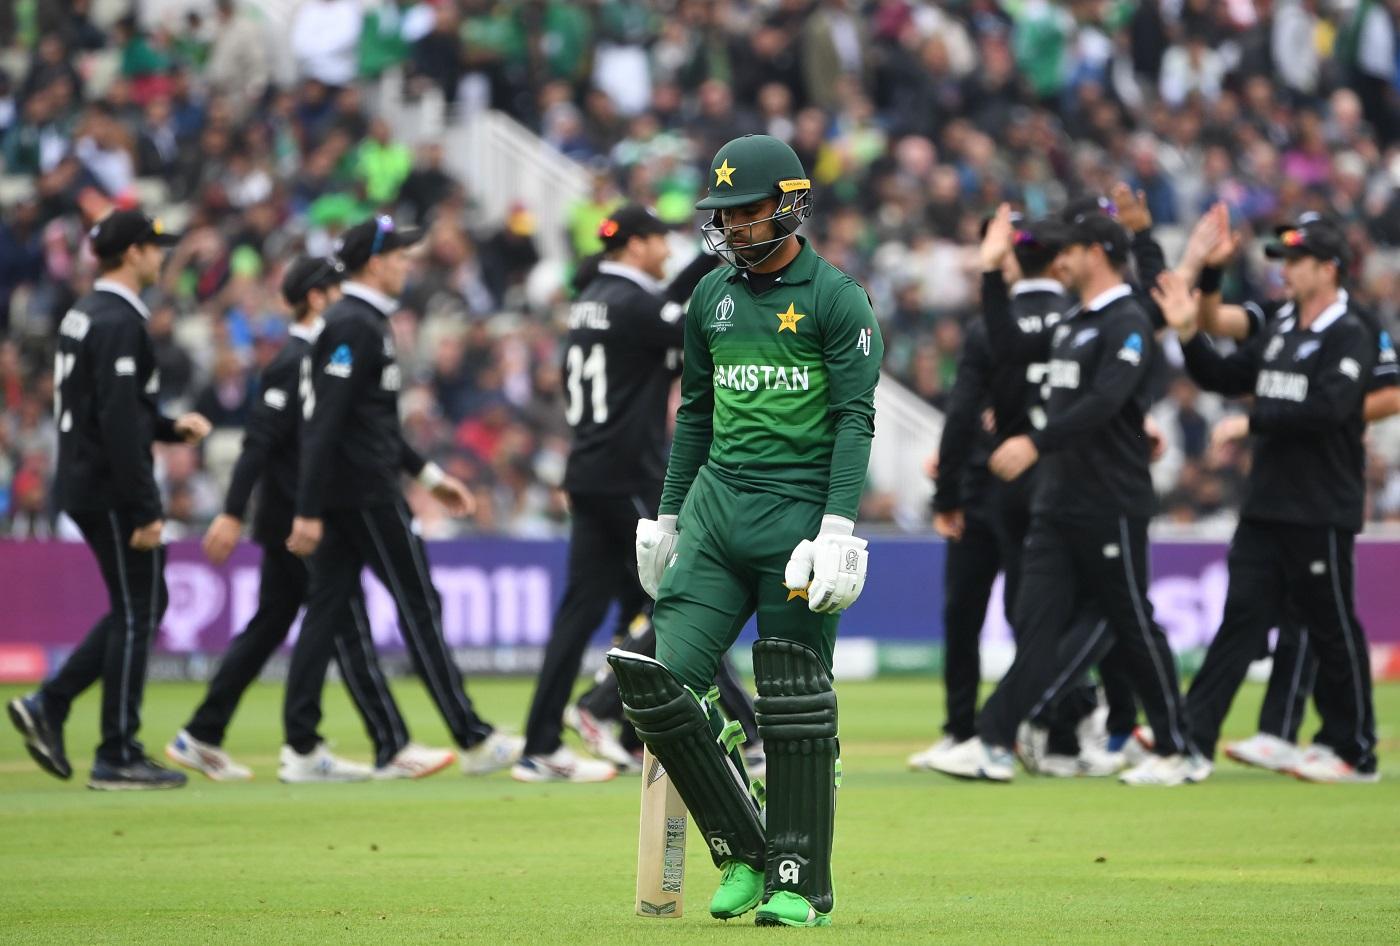 Amid coaching-staff vacuum, Misbah-ul-Haq to lead Pakistan training camp